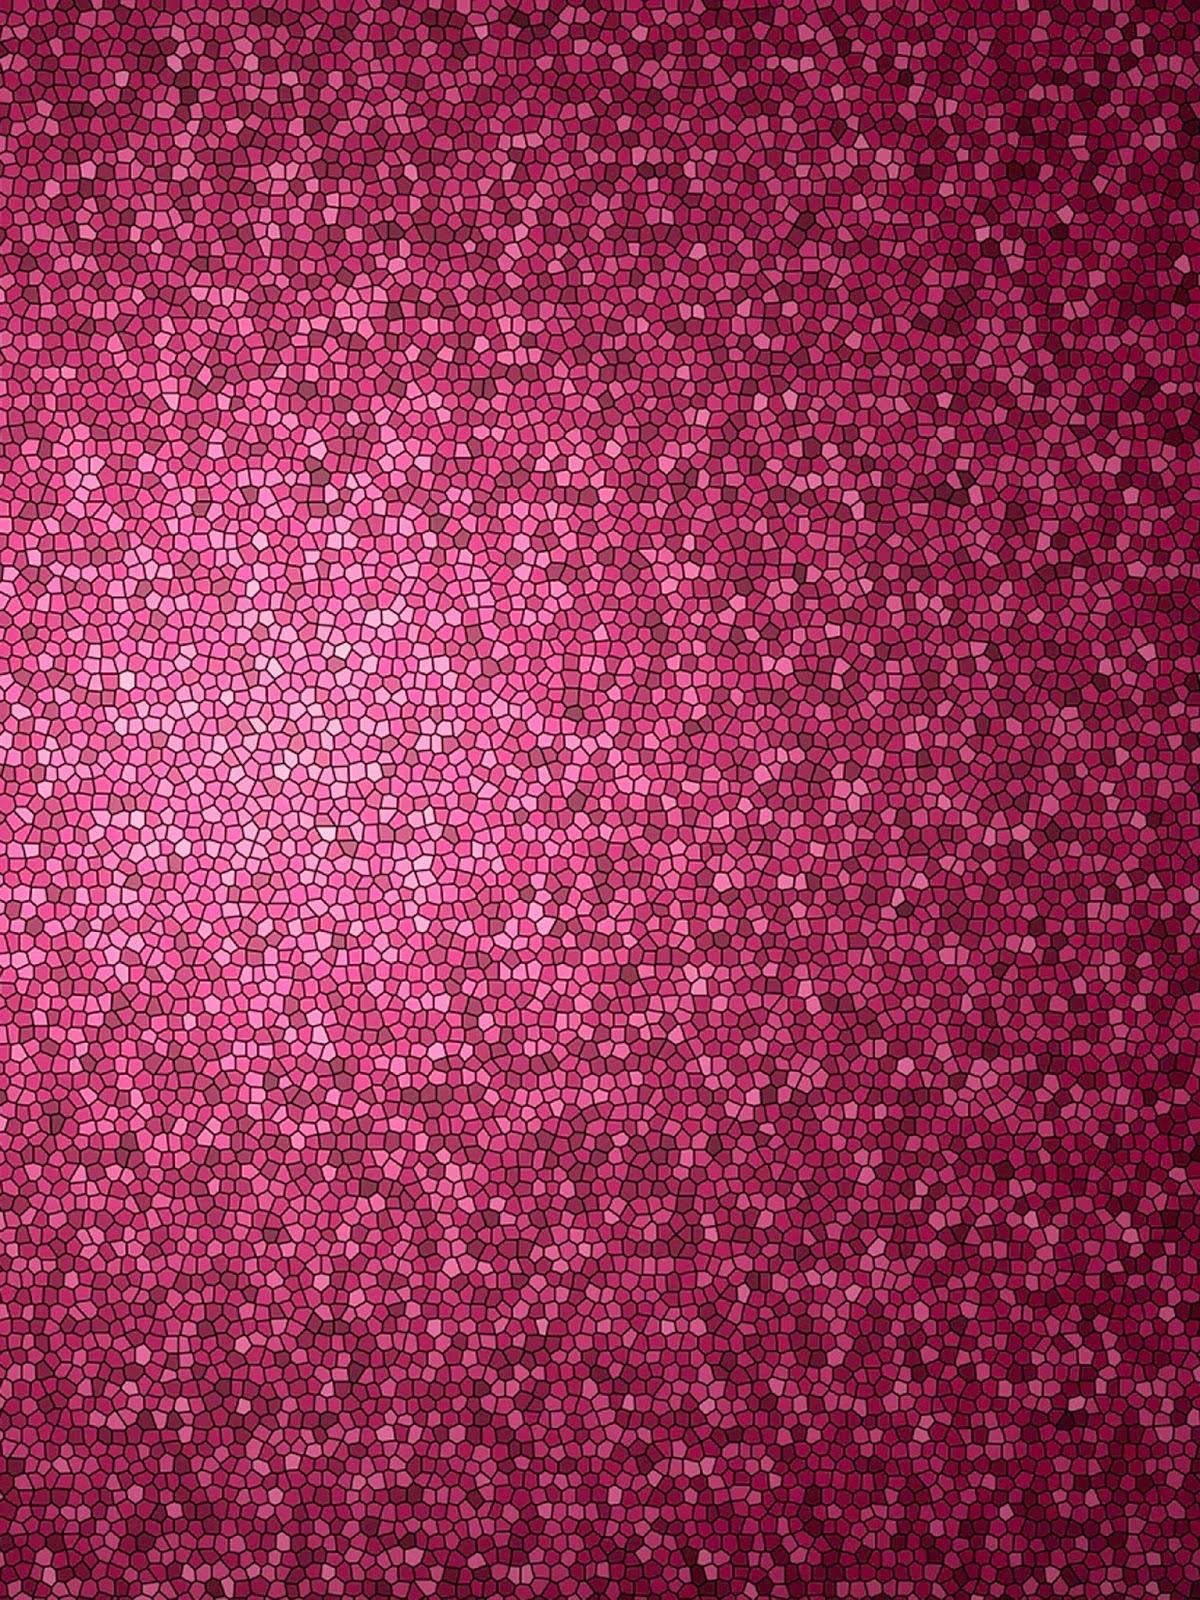 Cheetah Print Wallpaper Hd Doodlecraft Geometric Mosaic Ombre Freebie Background